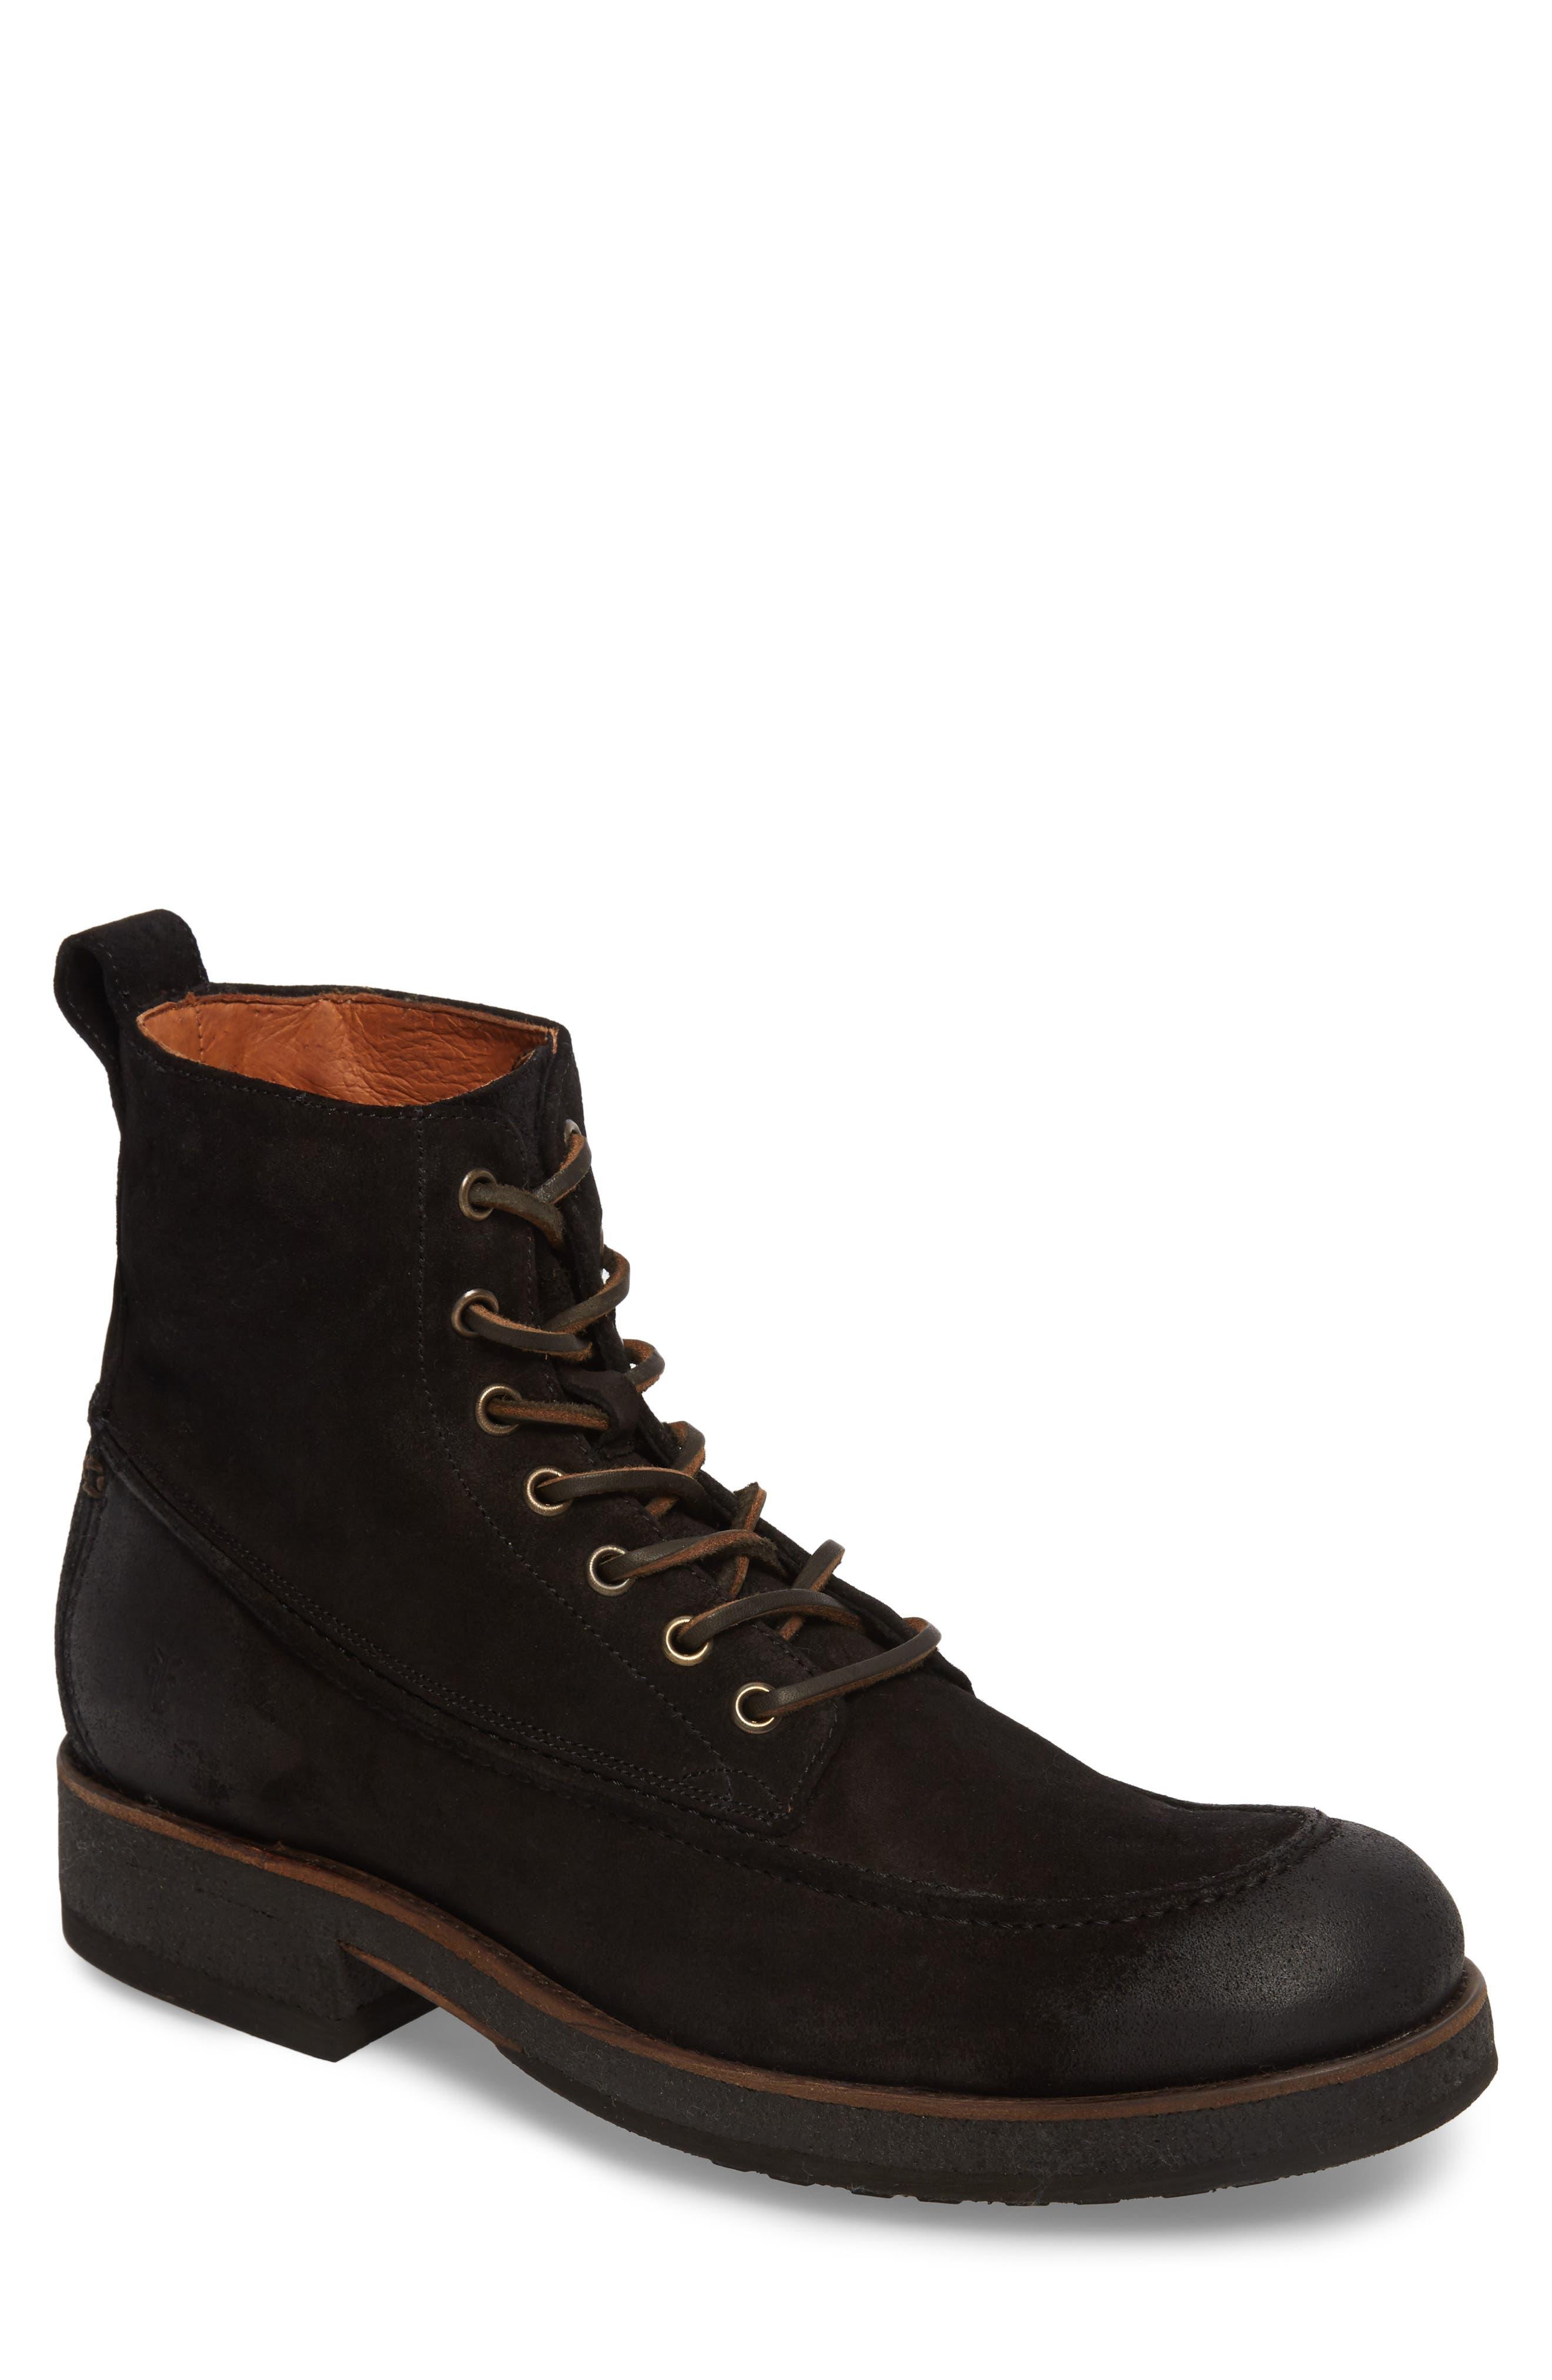 Rainier Waxed Work Boot,                         Main,                         color, Black Waxed Suede